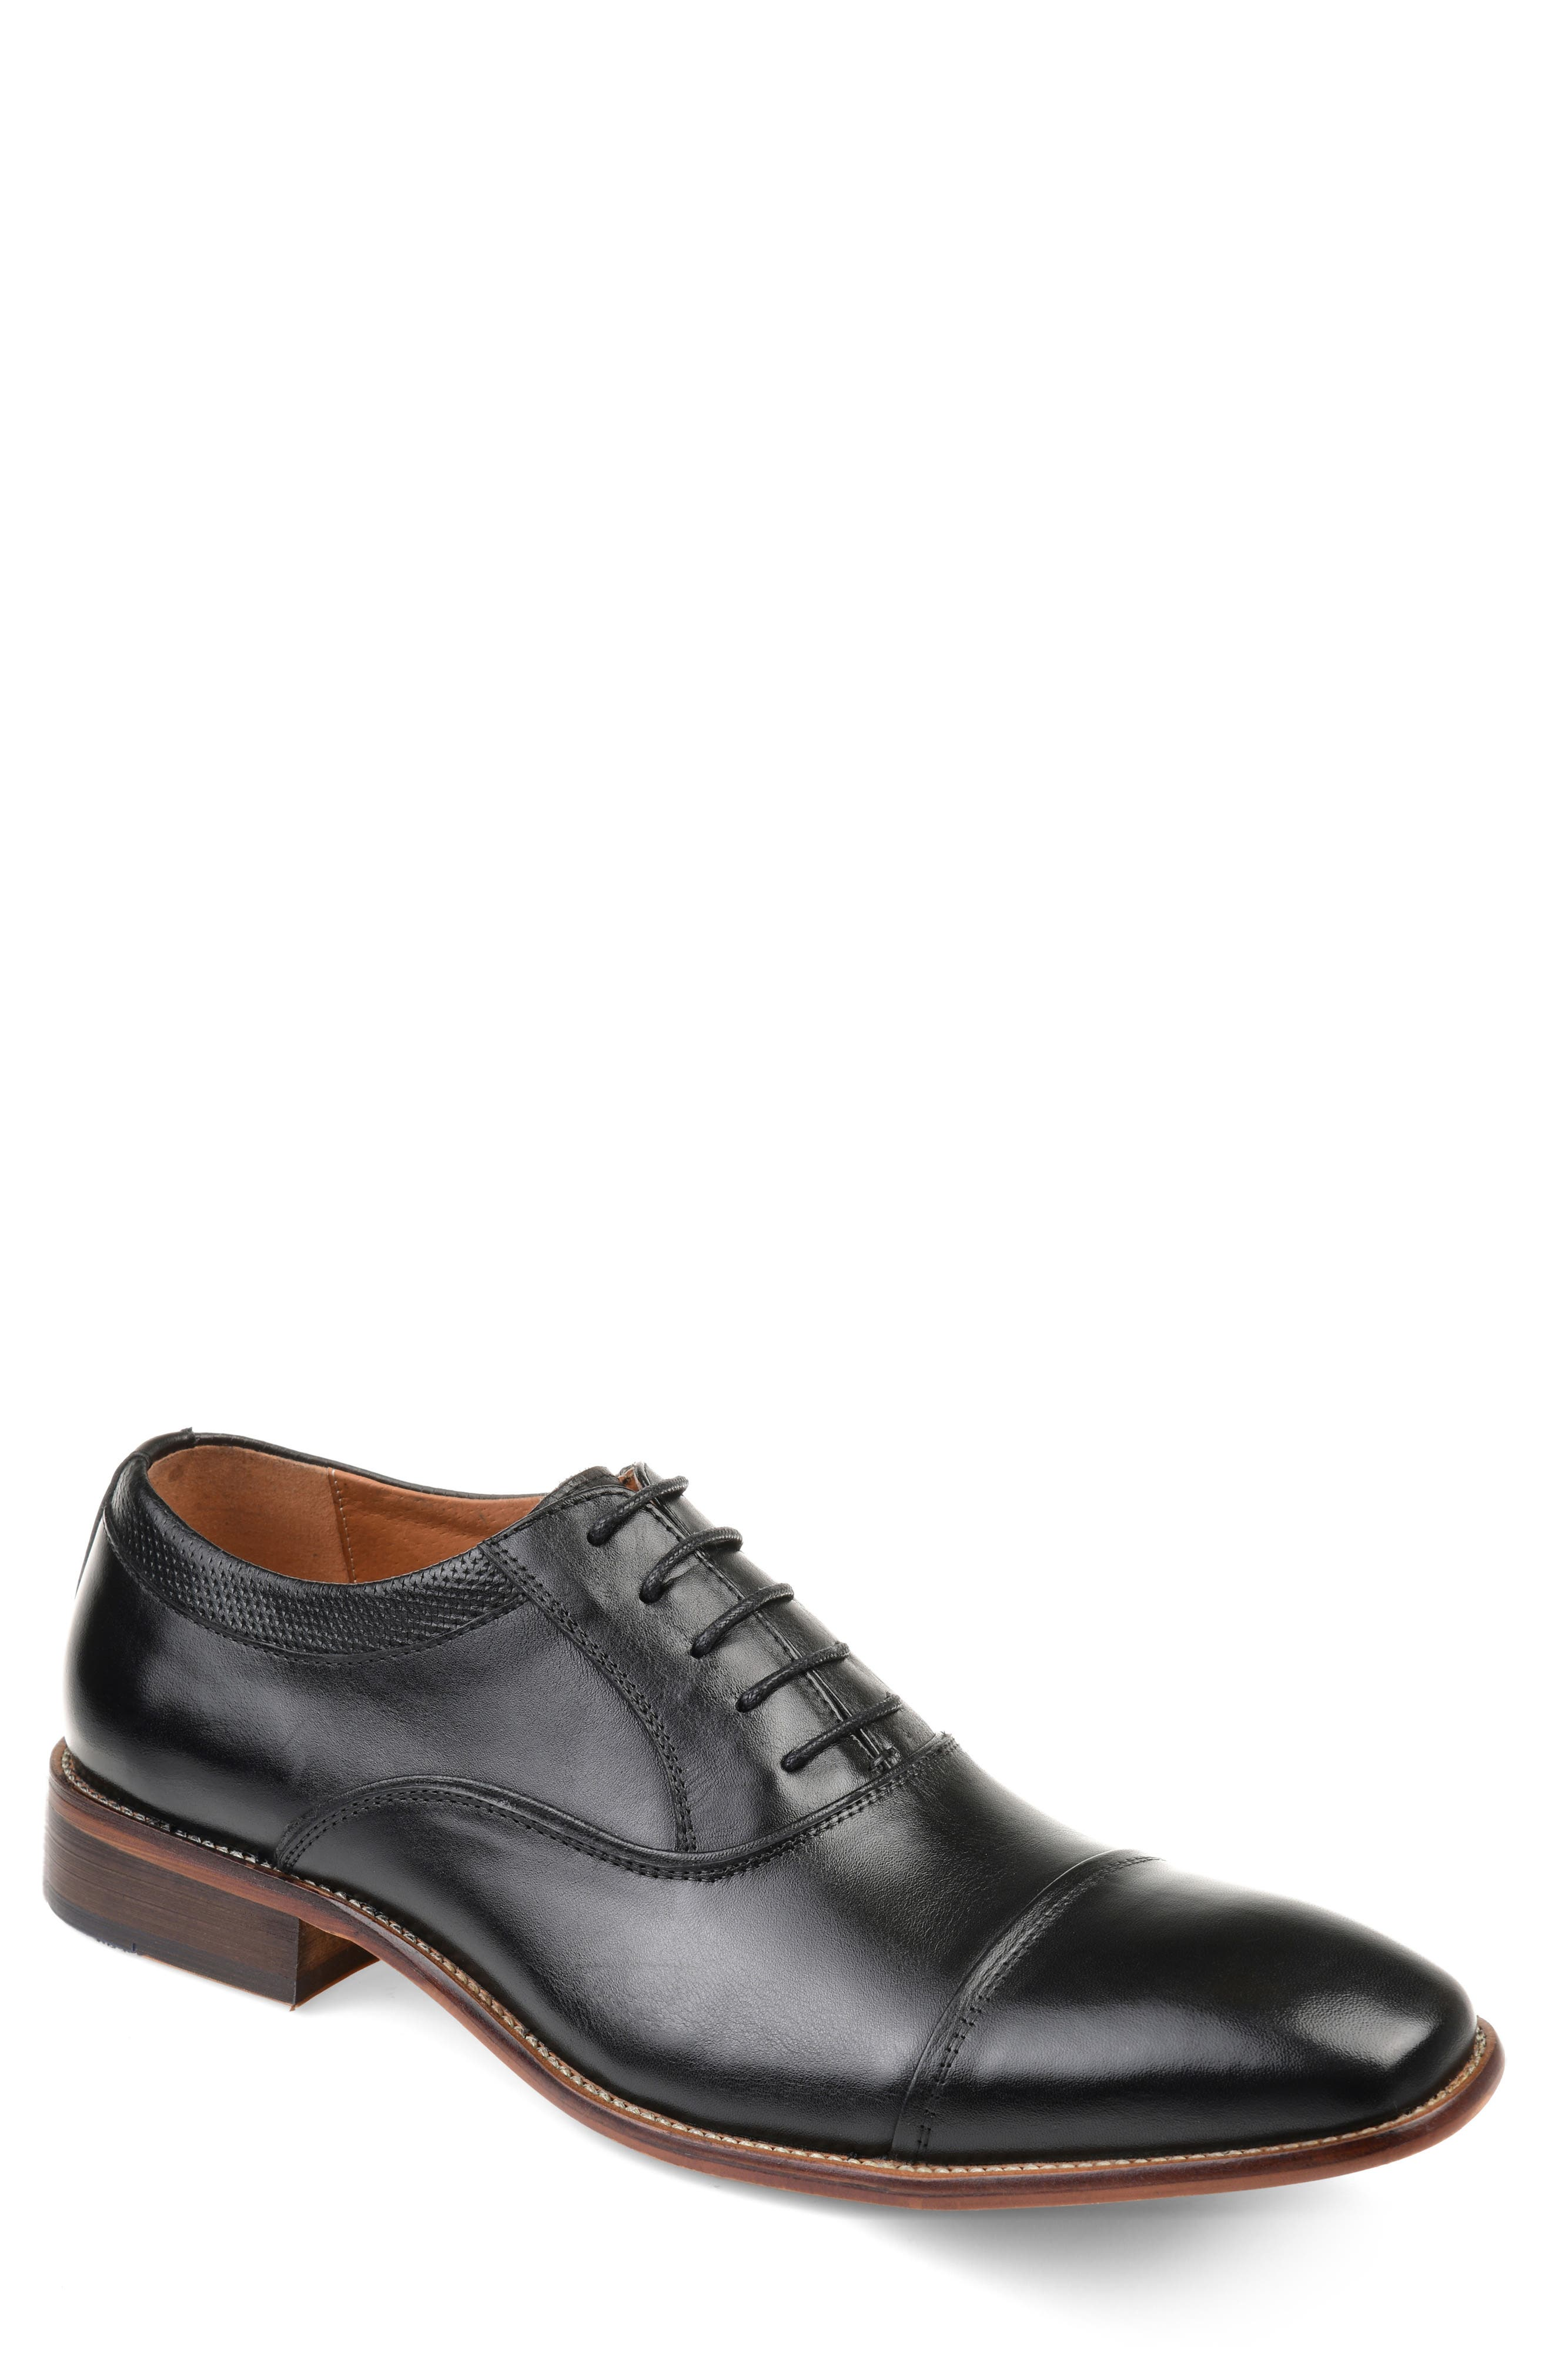 Keaton Cap Toe Oxford, Main, color, BLACK LEATHER